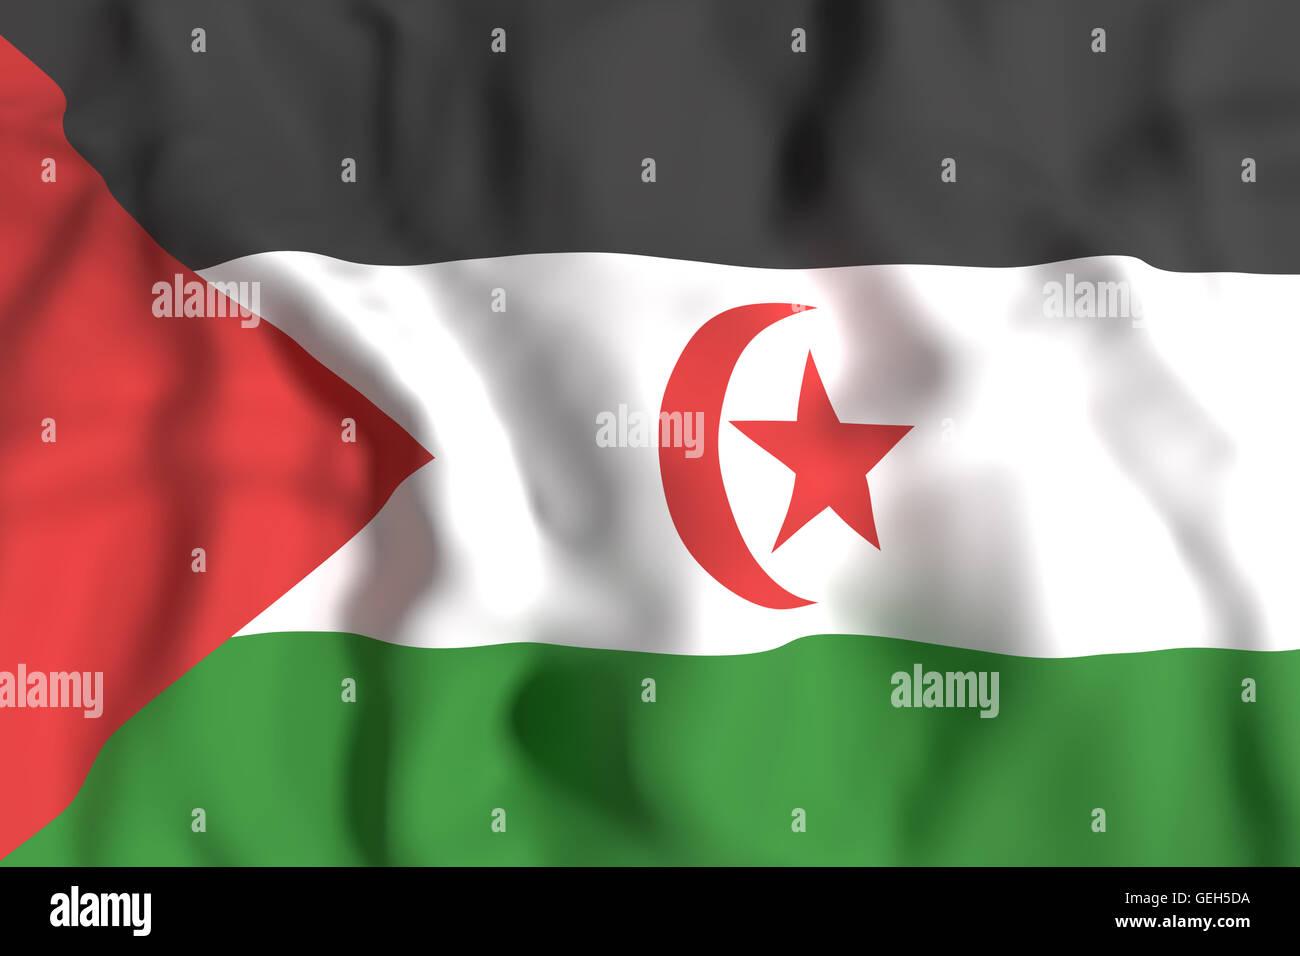 3d rendering of Sahrawi Arab Democratic Republic flag waving - Stock Image